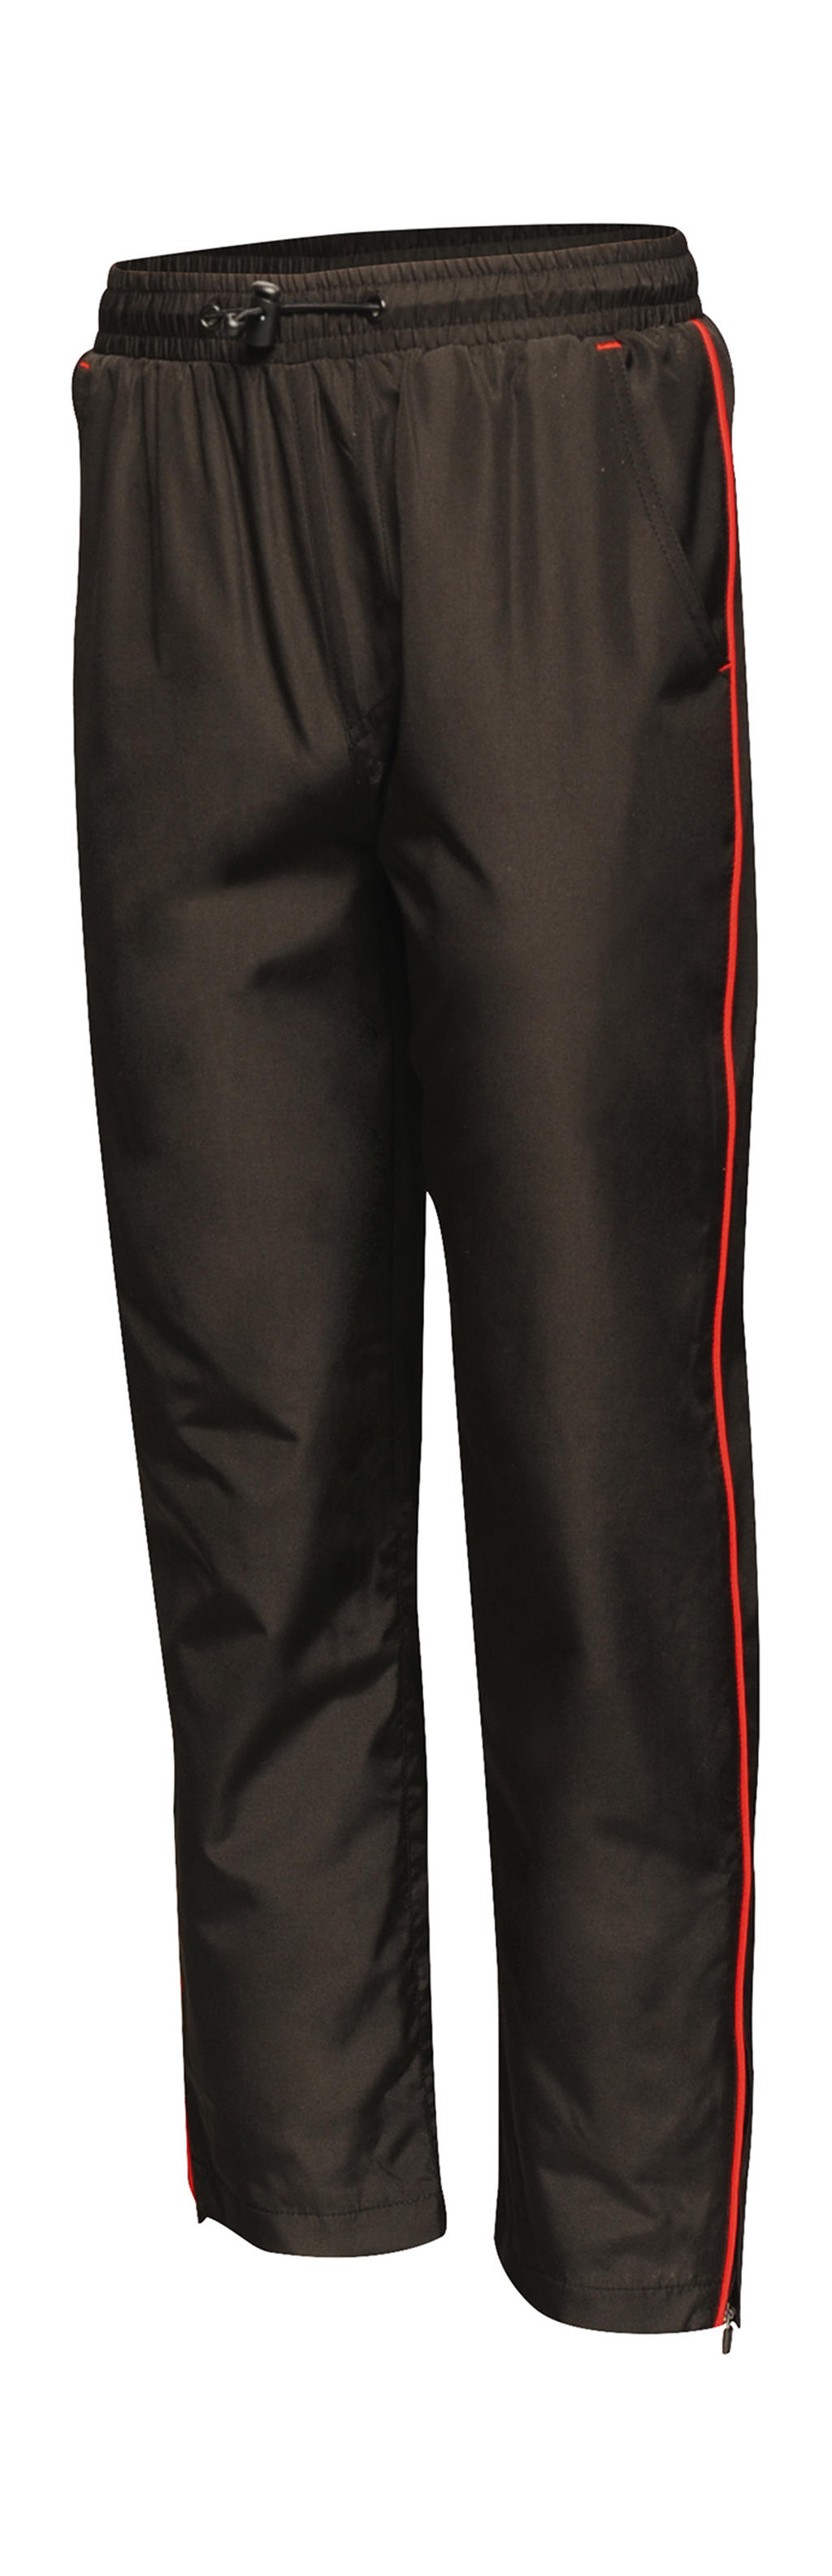 Detské nohavice  Athens Tracksuit Trousers